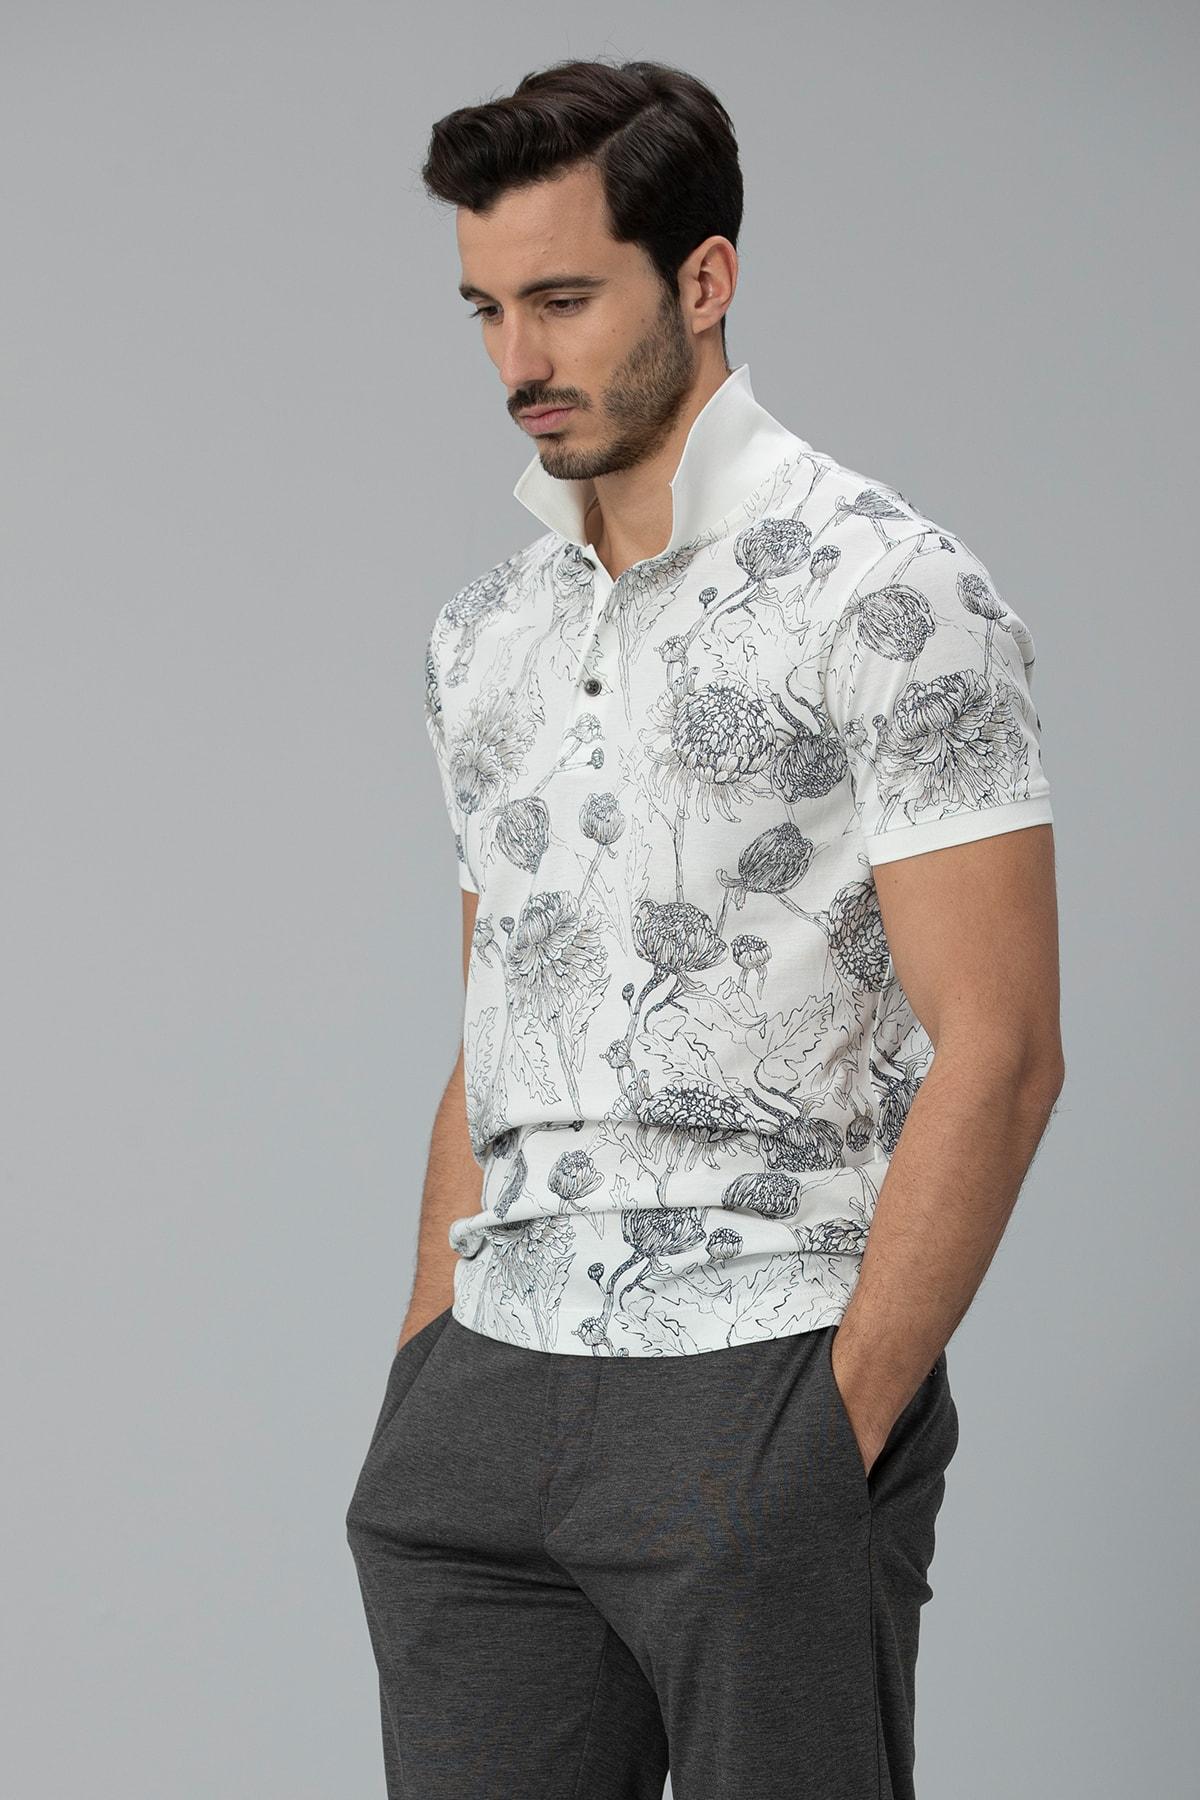 Lufian Capri Spor Polo T- Shirt Kırık Beyaz 0